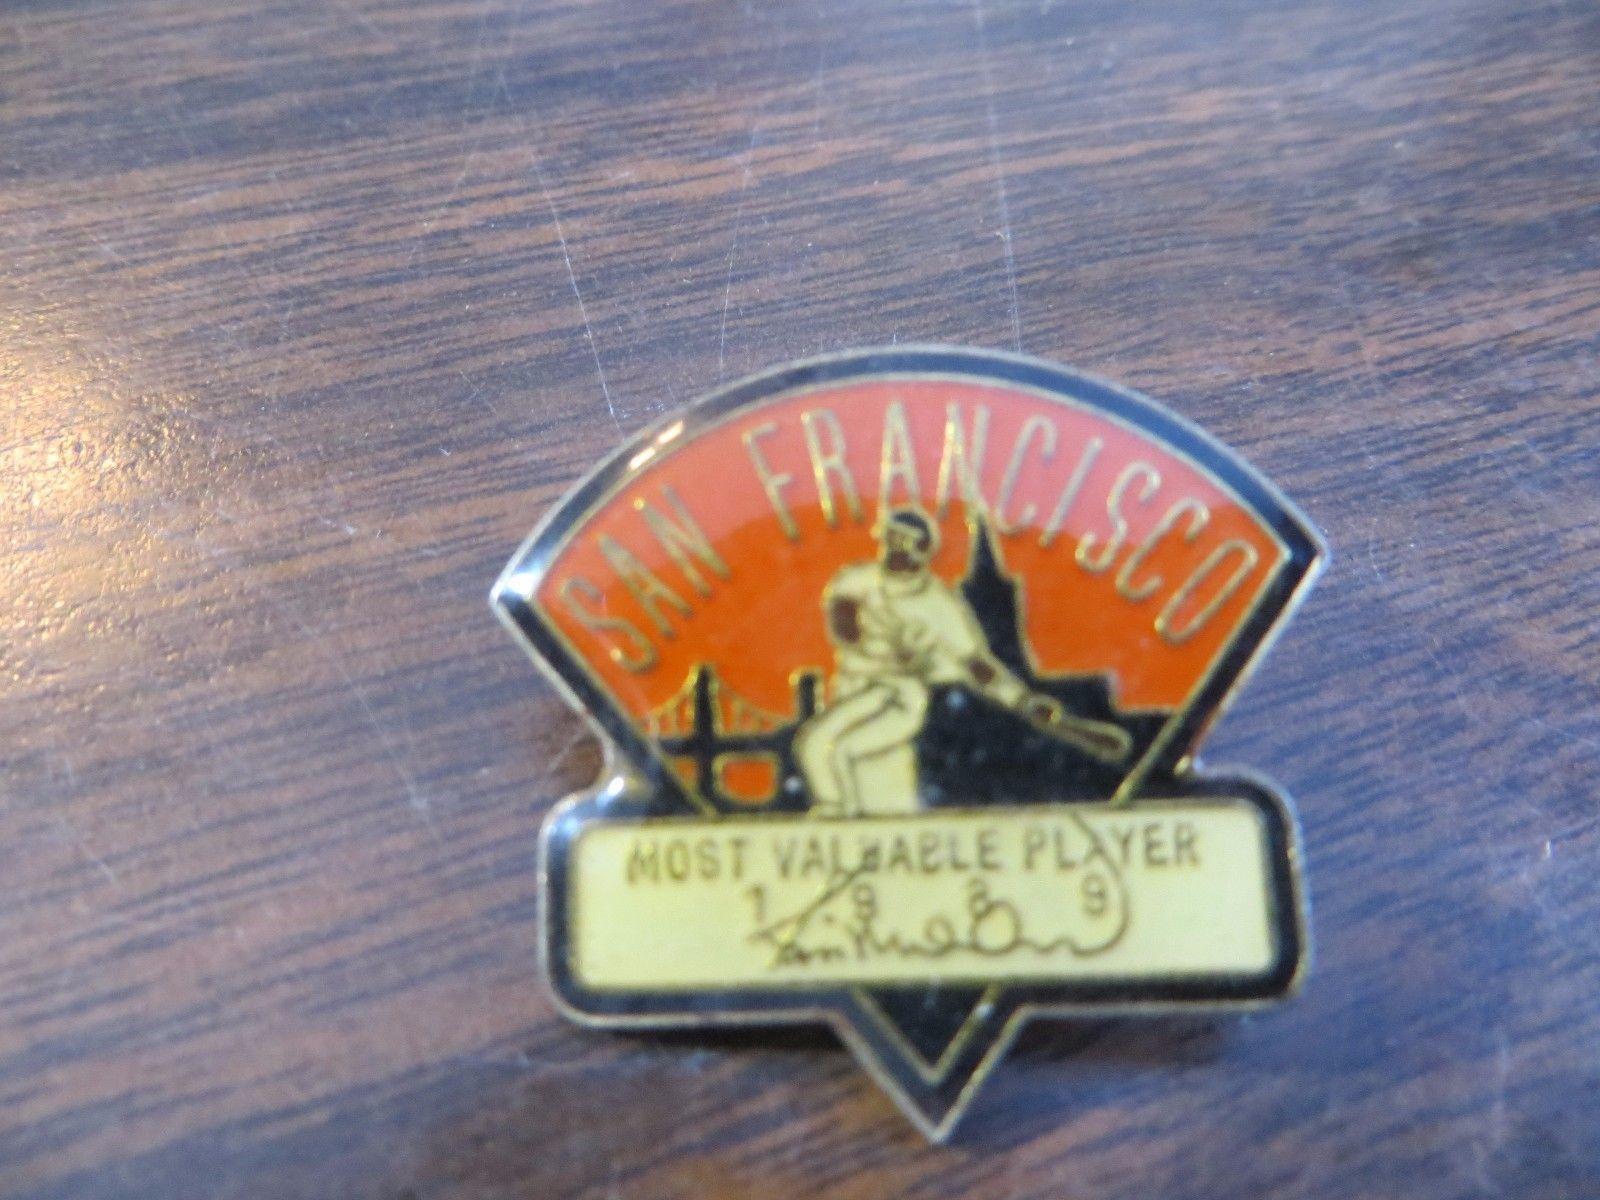 SAN FRANCISCO MOST VALUABLE PLAYER BASEBALL MLB,CHEVRON GAS ADVERTISING pin